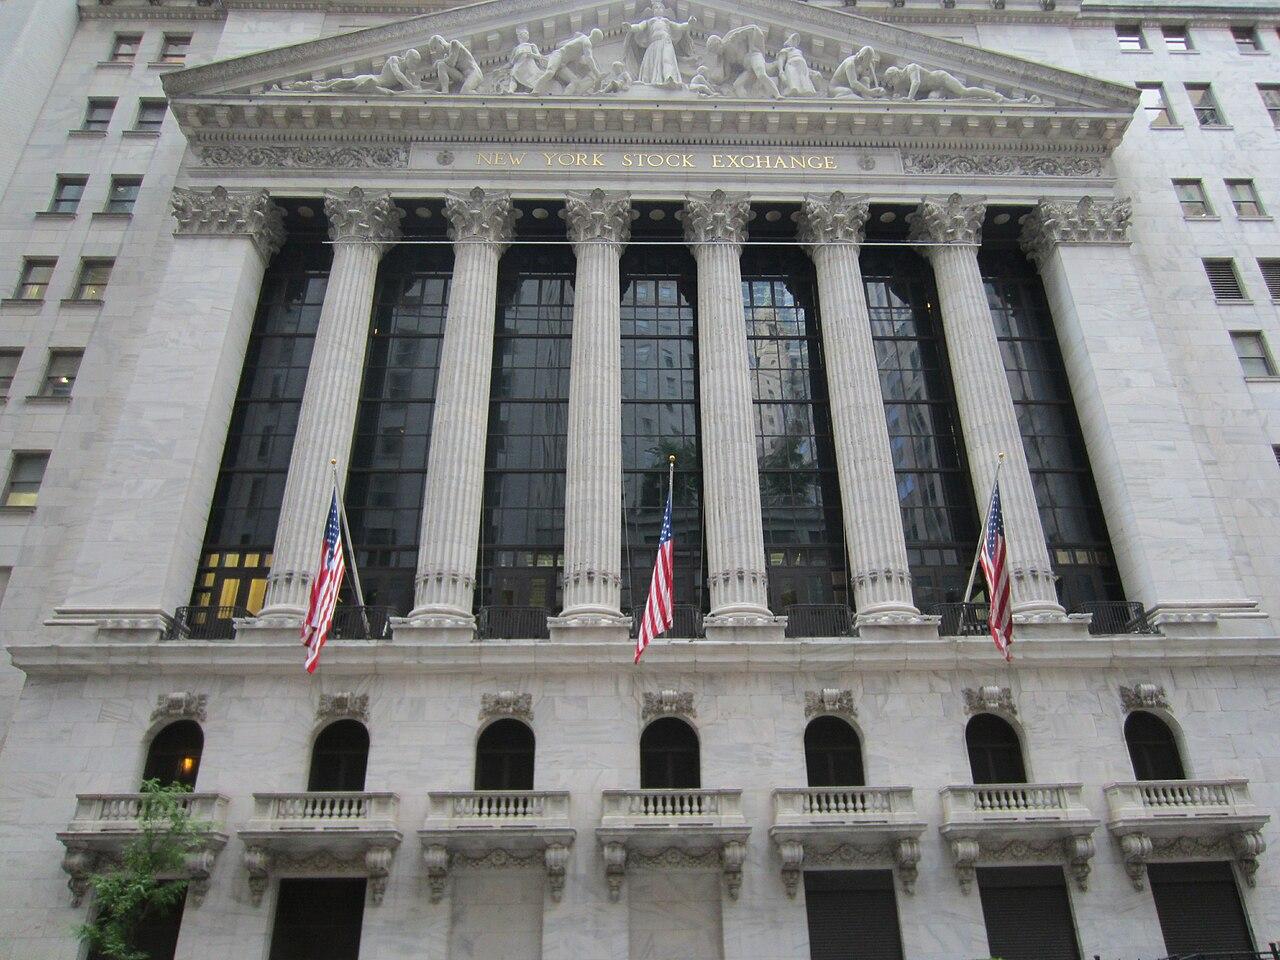 File:New York Stock Exchange New York City, May 2014 - 048 ...